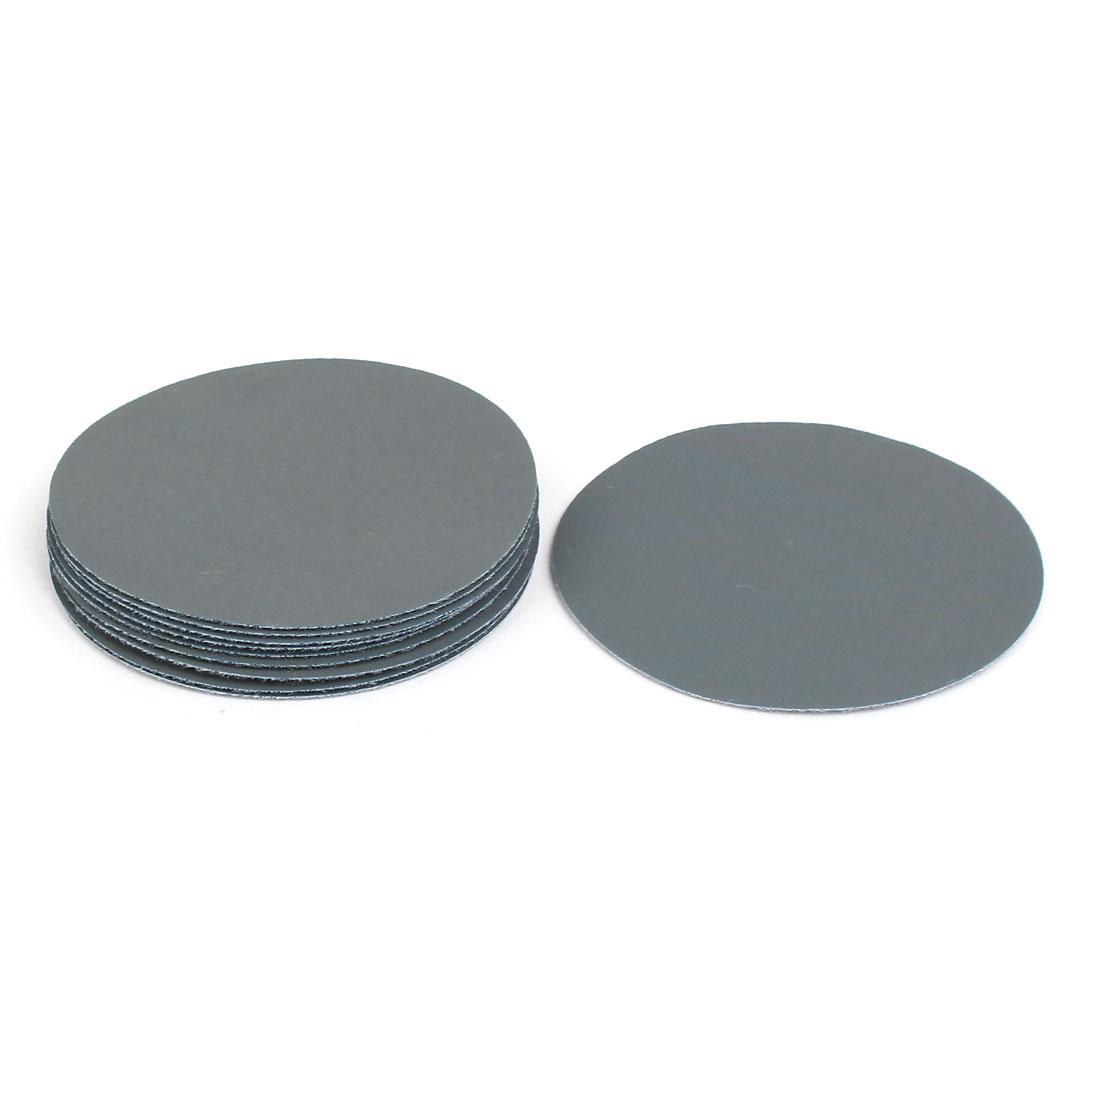 "3000 Grit 3"" Diameter Sandpaper Hook Loop Sanding Disc 10 Pcs"